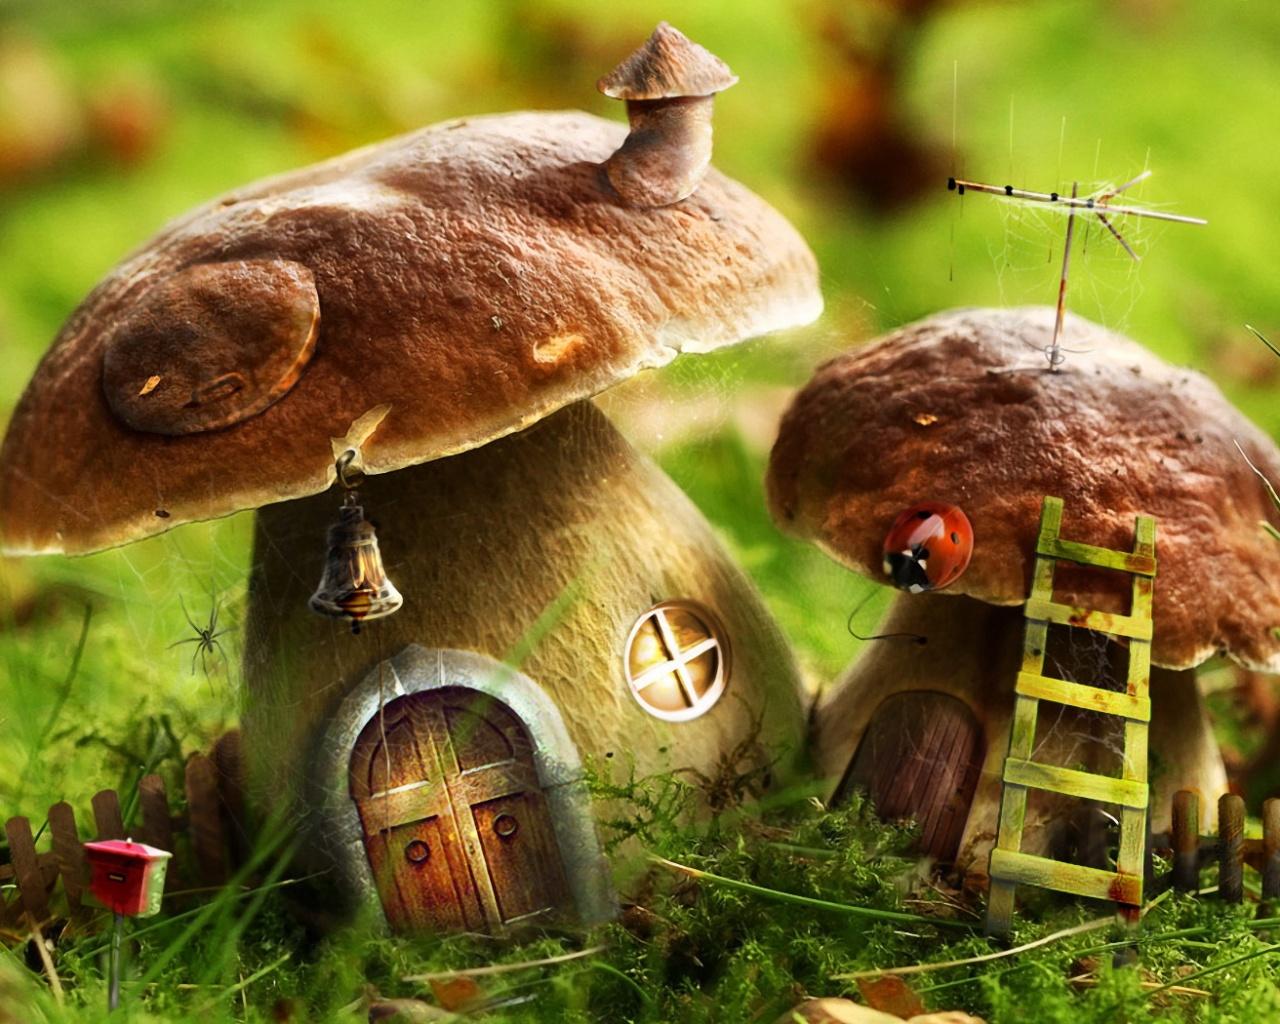 http://www.zastavki.com/pictures/1280x1024/2009/Drawn_wallpapers_Mushroom_houses_016300_.jpg